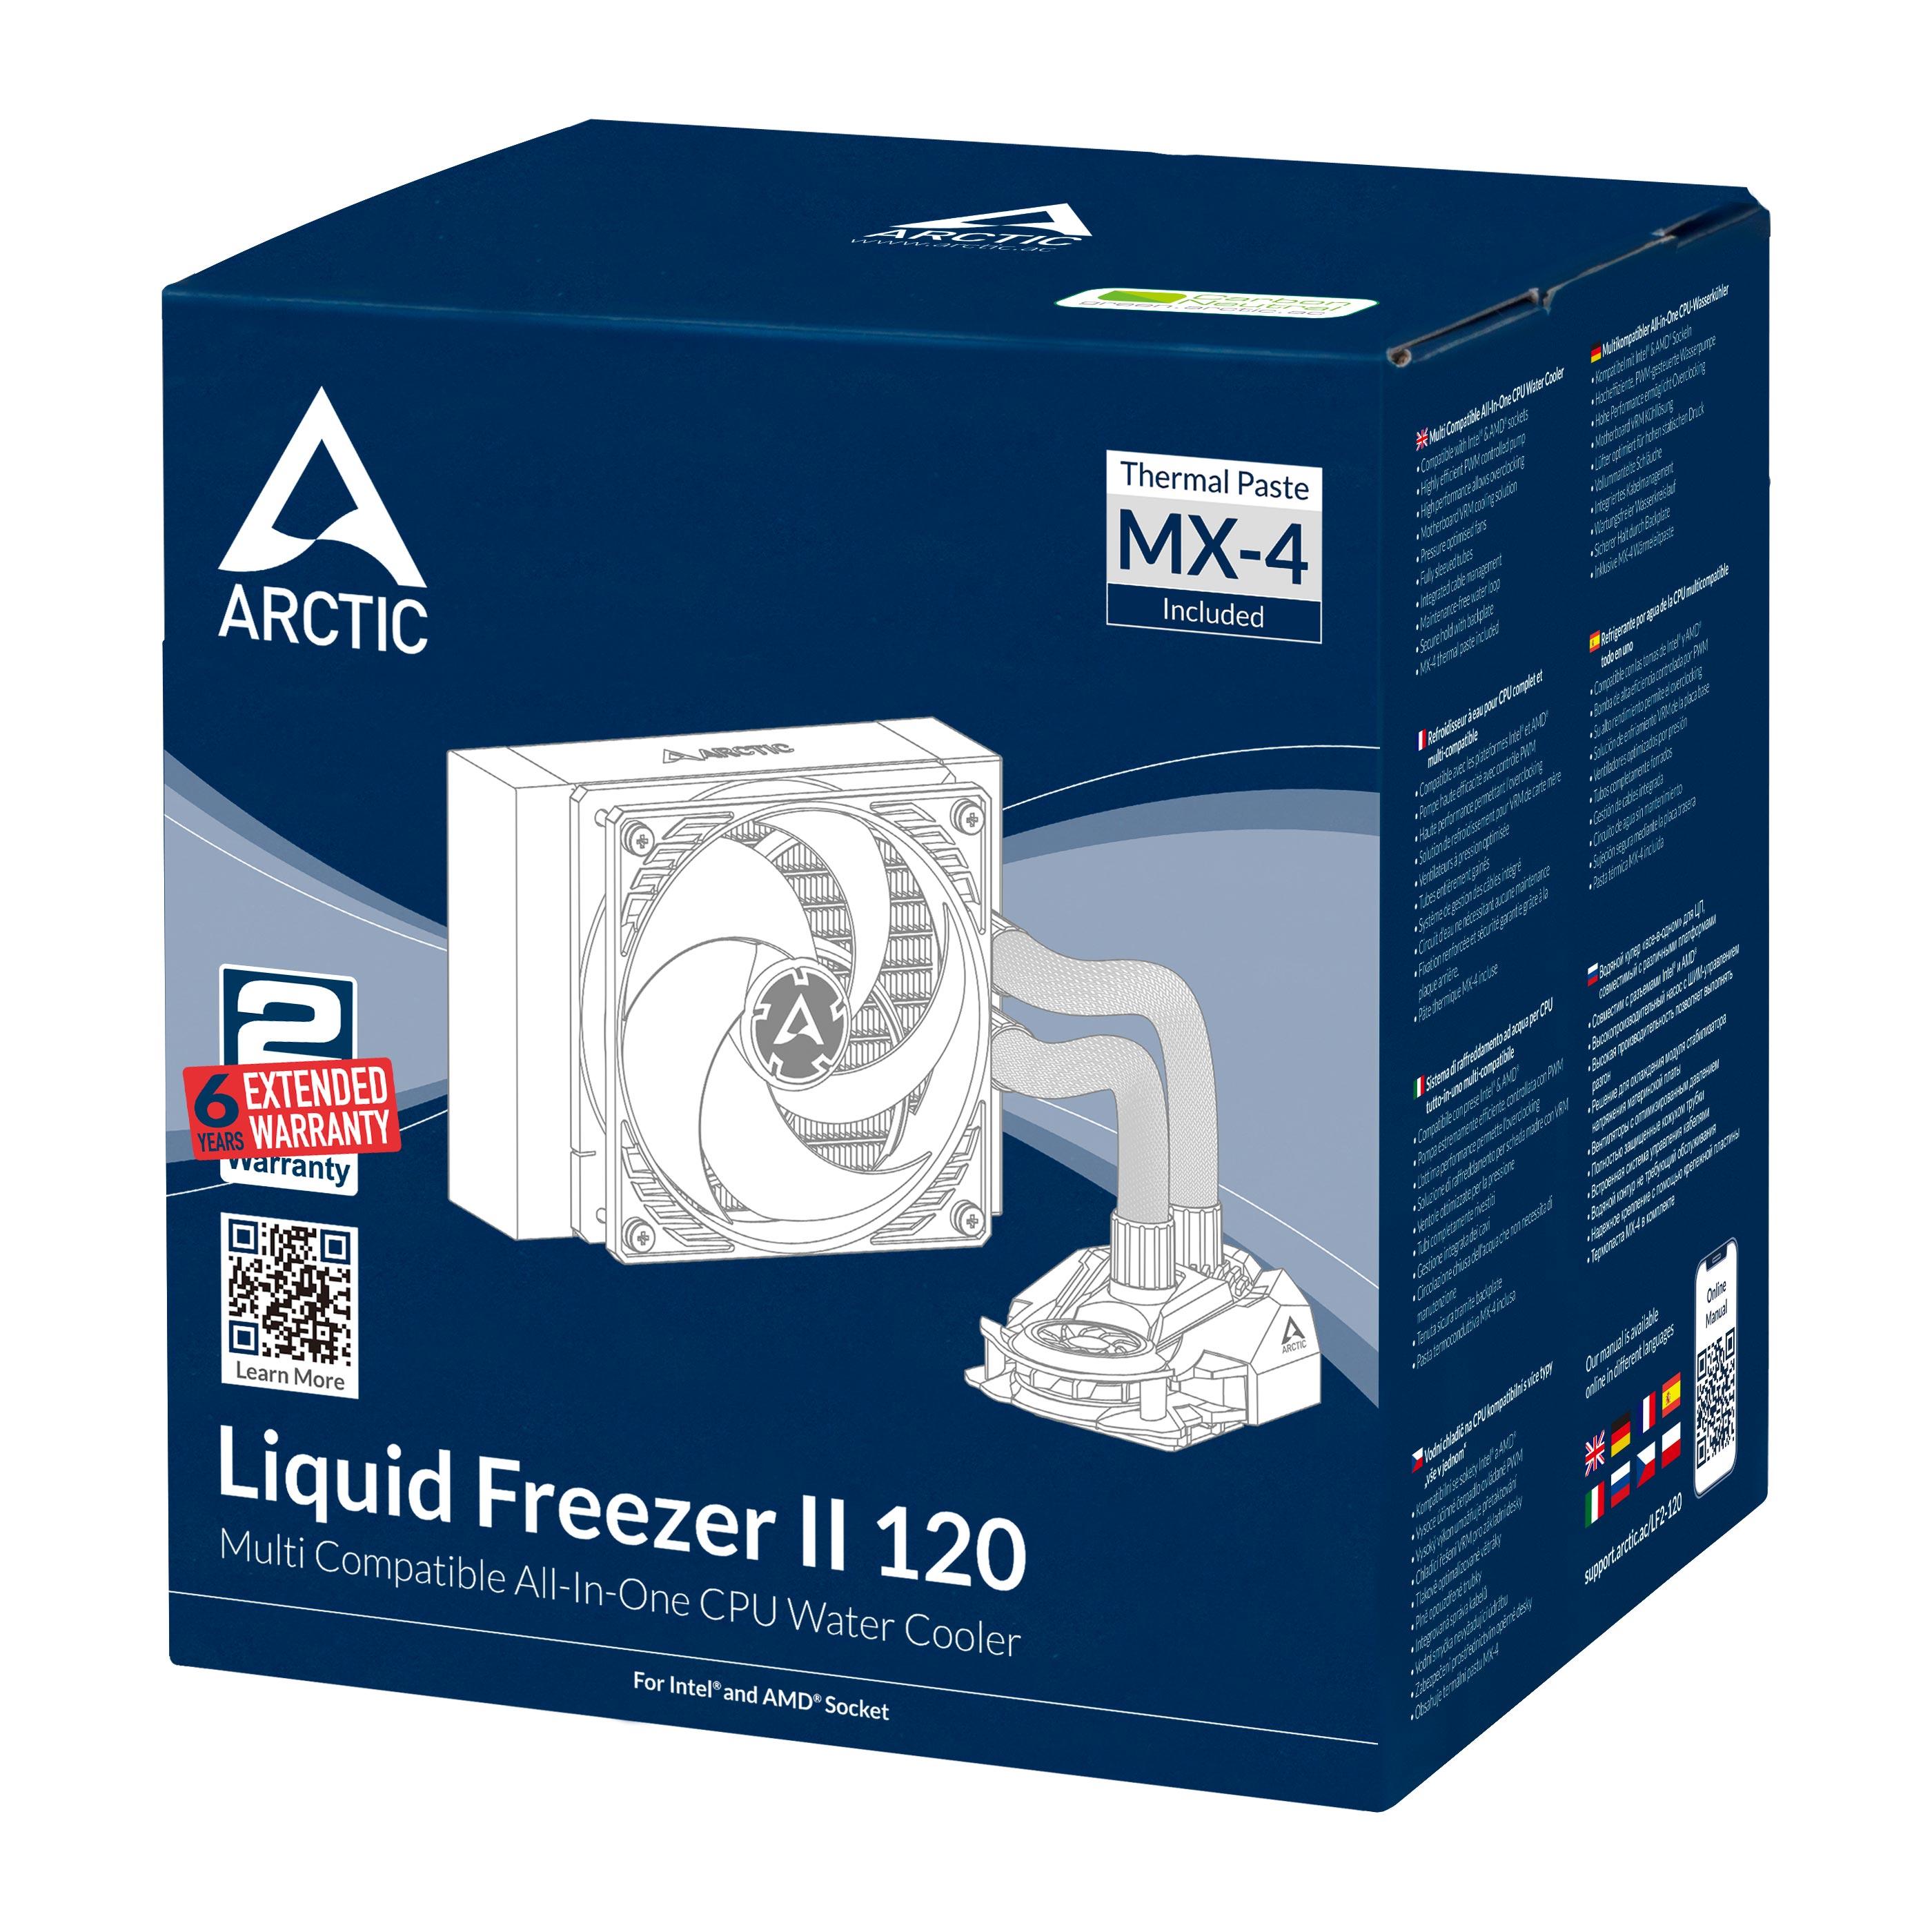 Multi-Compatible AiO CPU Water Cooler ARCTIC Liquid Freezer II 120 Packaging Front View